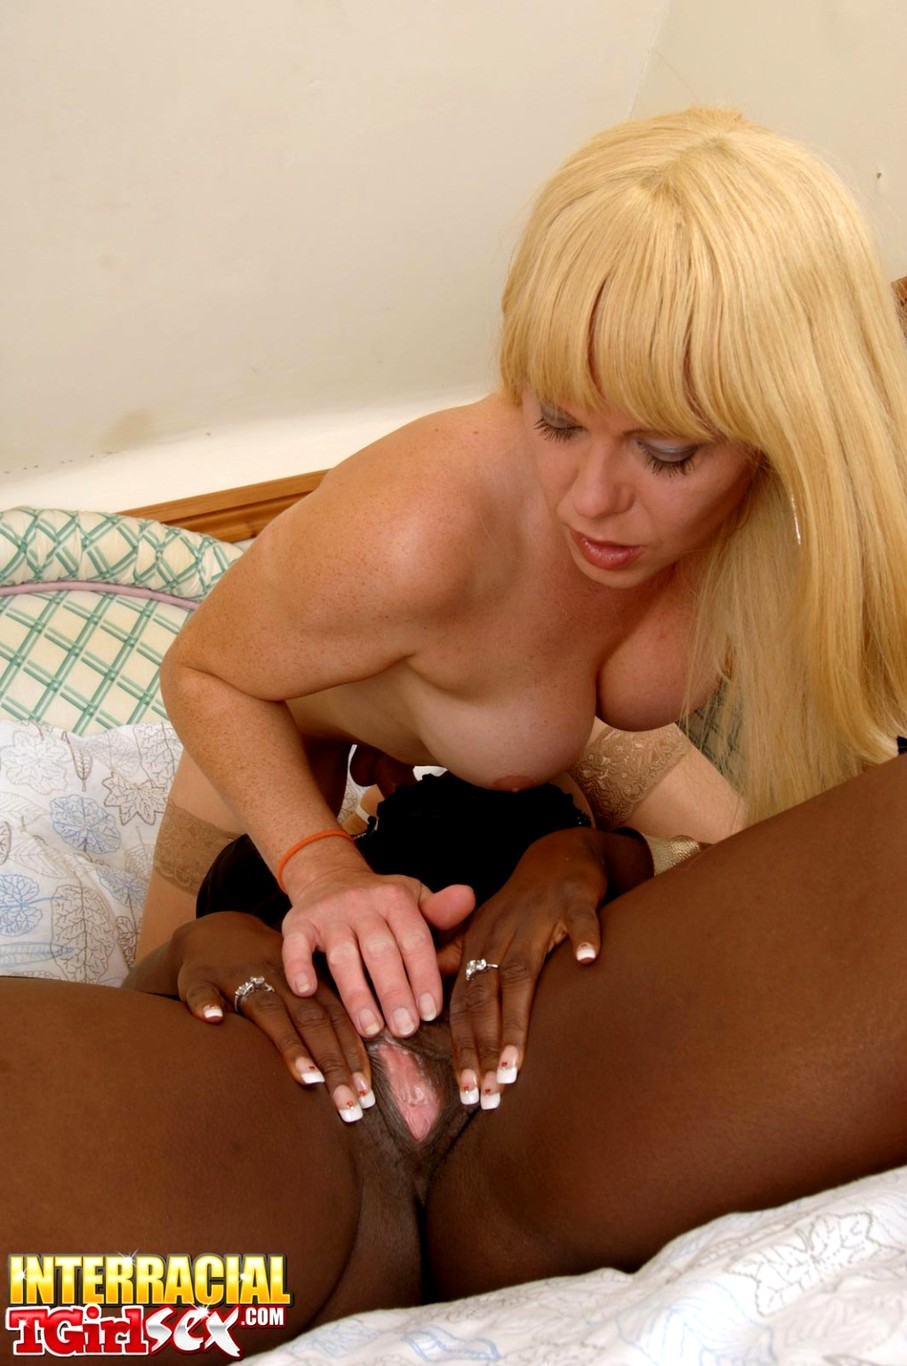 Tgirl joanna jet interracial